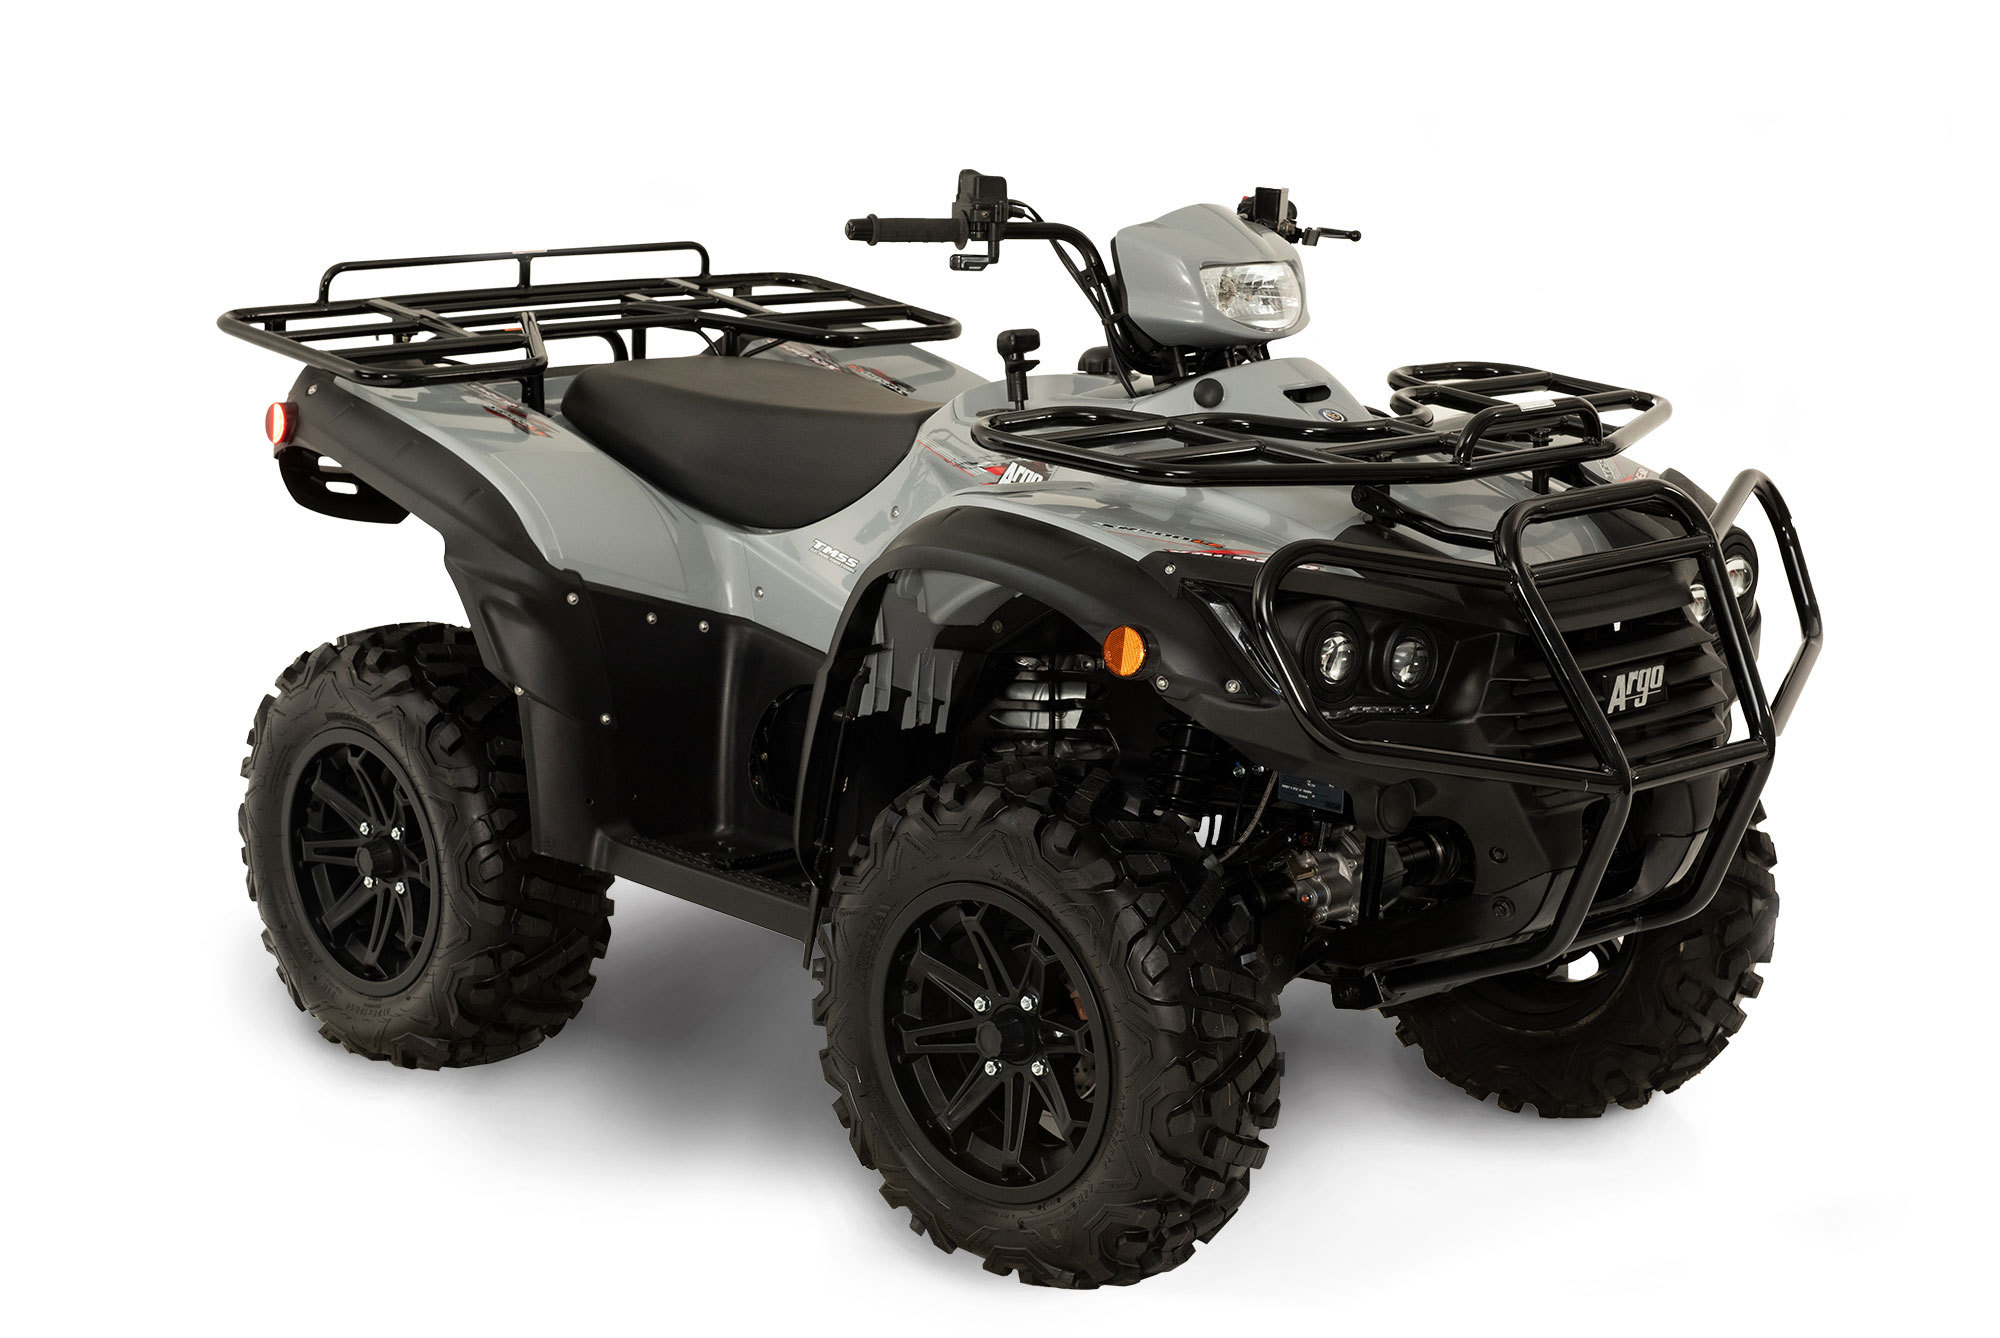 Silver - ATV Only